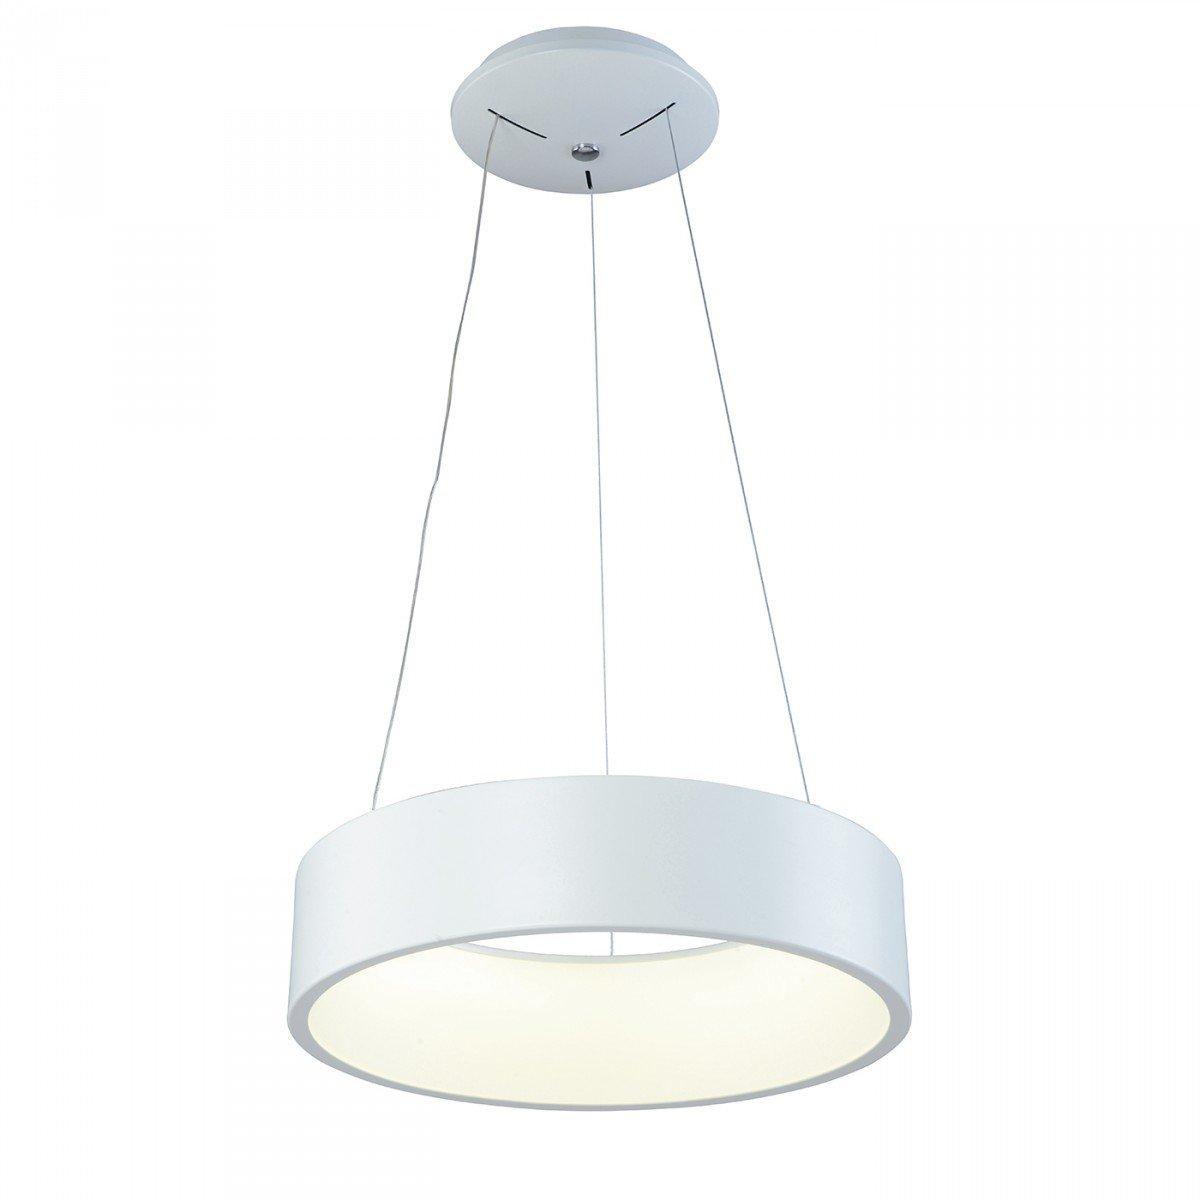 Hole Lámpara Colgante blanco 32W LED 45,5x120cm